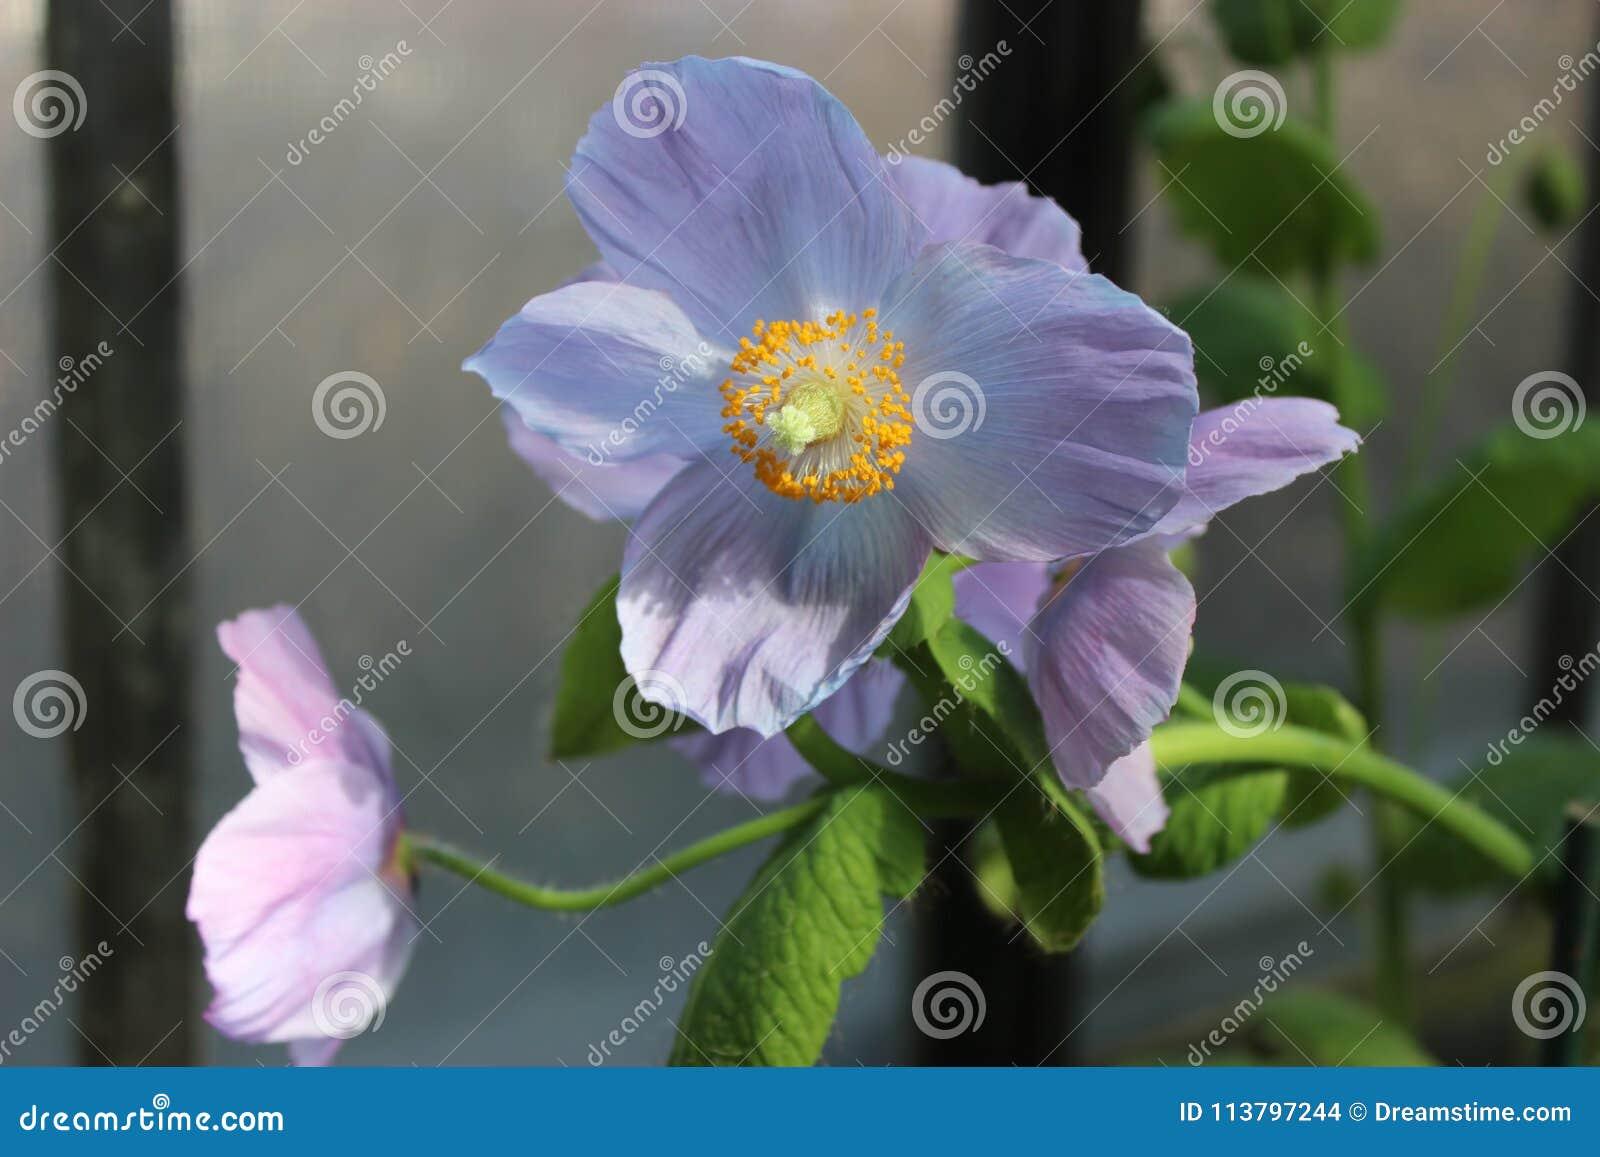 Rare And Beautiful Himalayan Blue Poppies Stock Photo Image Of